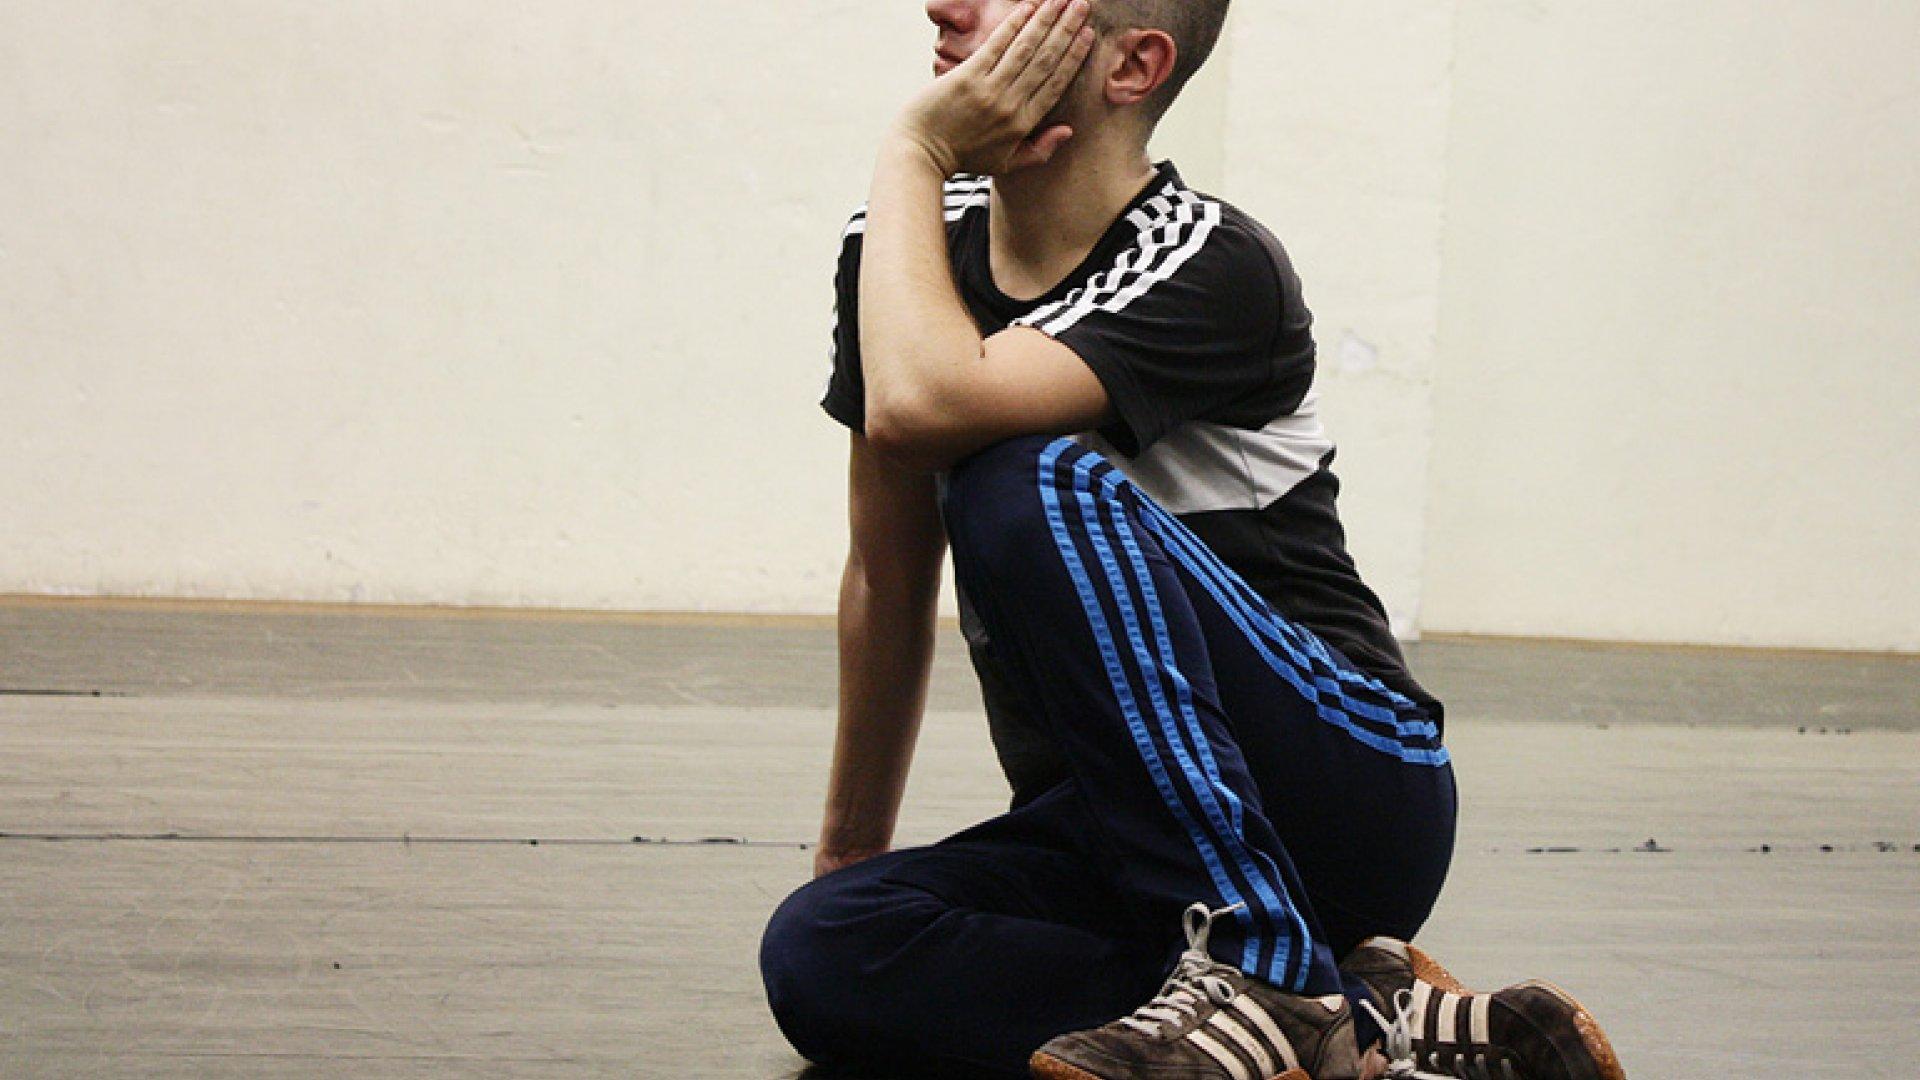 Canales Porno Baile Striptis En Barcelona actividad - baila-baila-bailando-ba | macba museu d'art